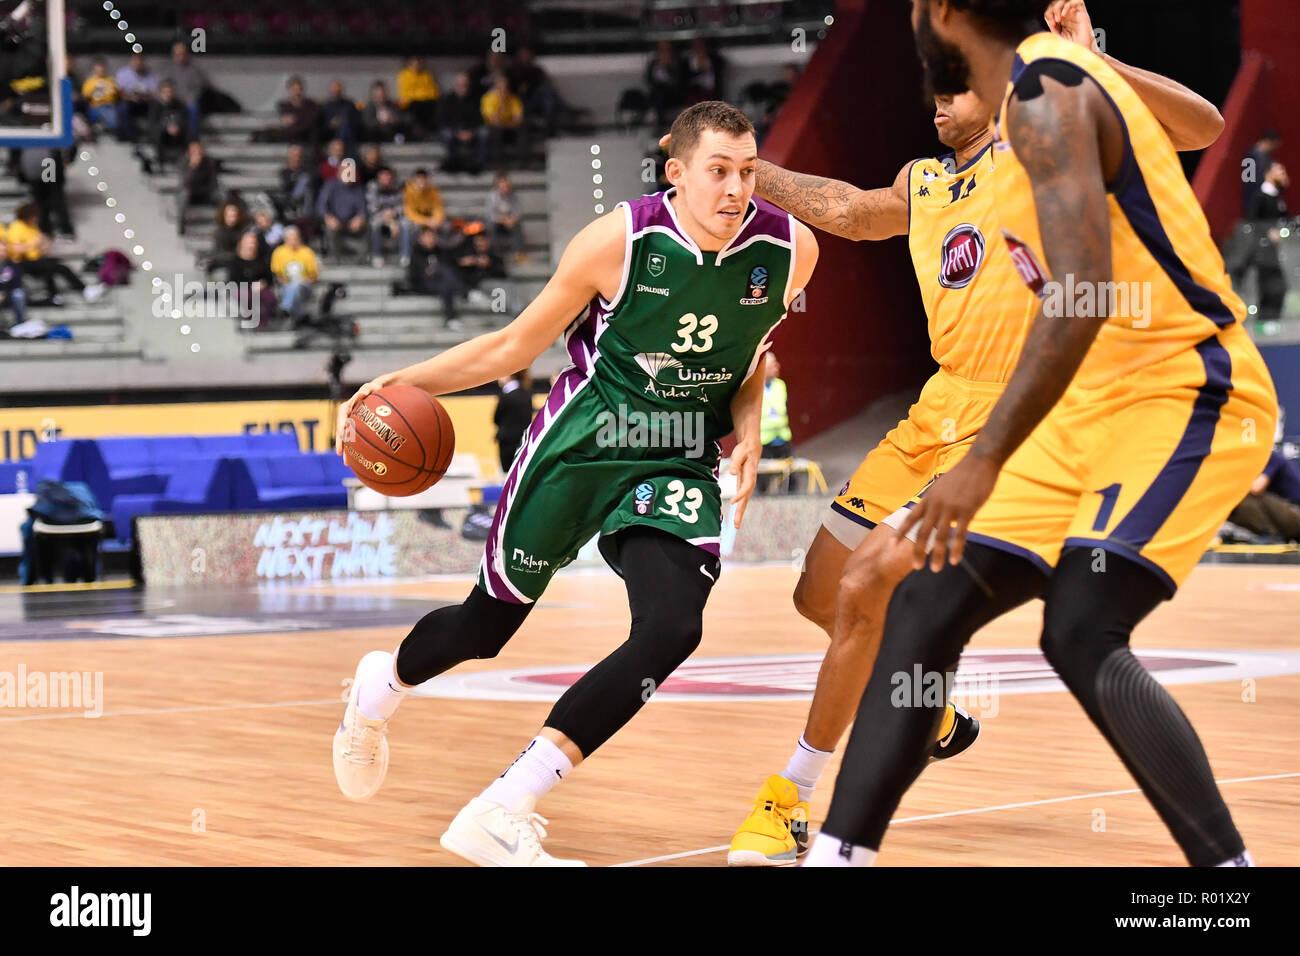 Turin, Italy. 31st Oct, 2018. Kile Wiltjer (Unicaja Malaga) during the 7 Days EuroCup 2018/19 basketball match between FIAT AUXILIUM TORINO VS UNICAJA MALAGA at PalaVela on 31 October, 2018 in Turin, Italy. Credit: FABIO PETROSINO/Alamy Live News - Stock Image